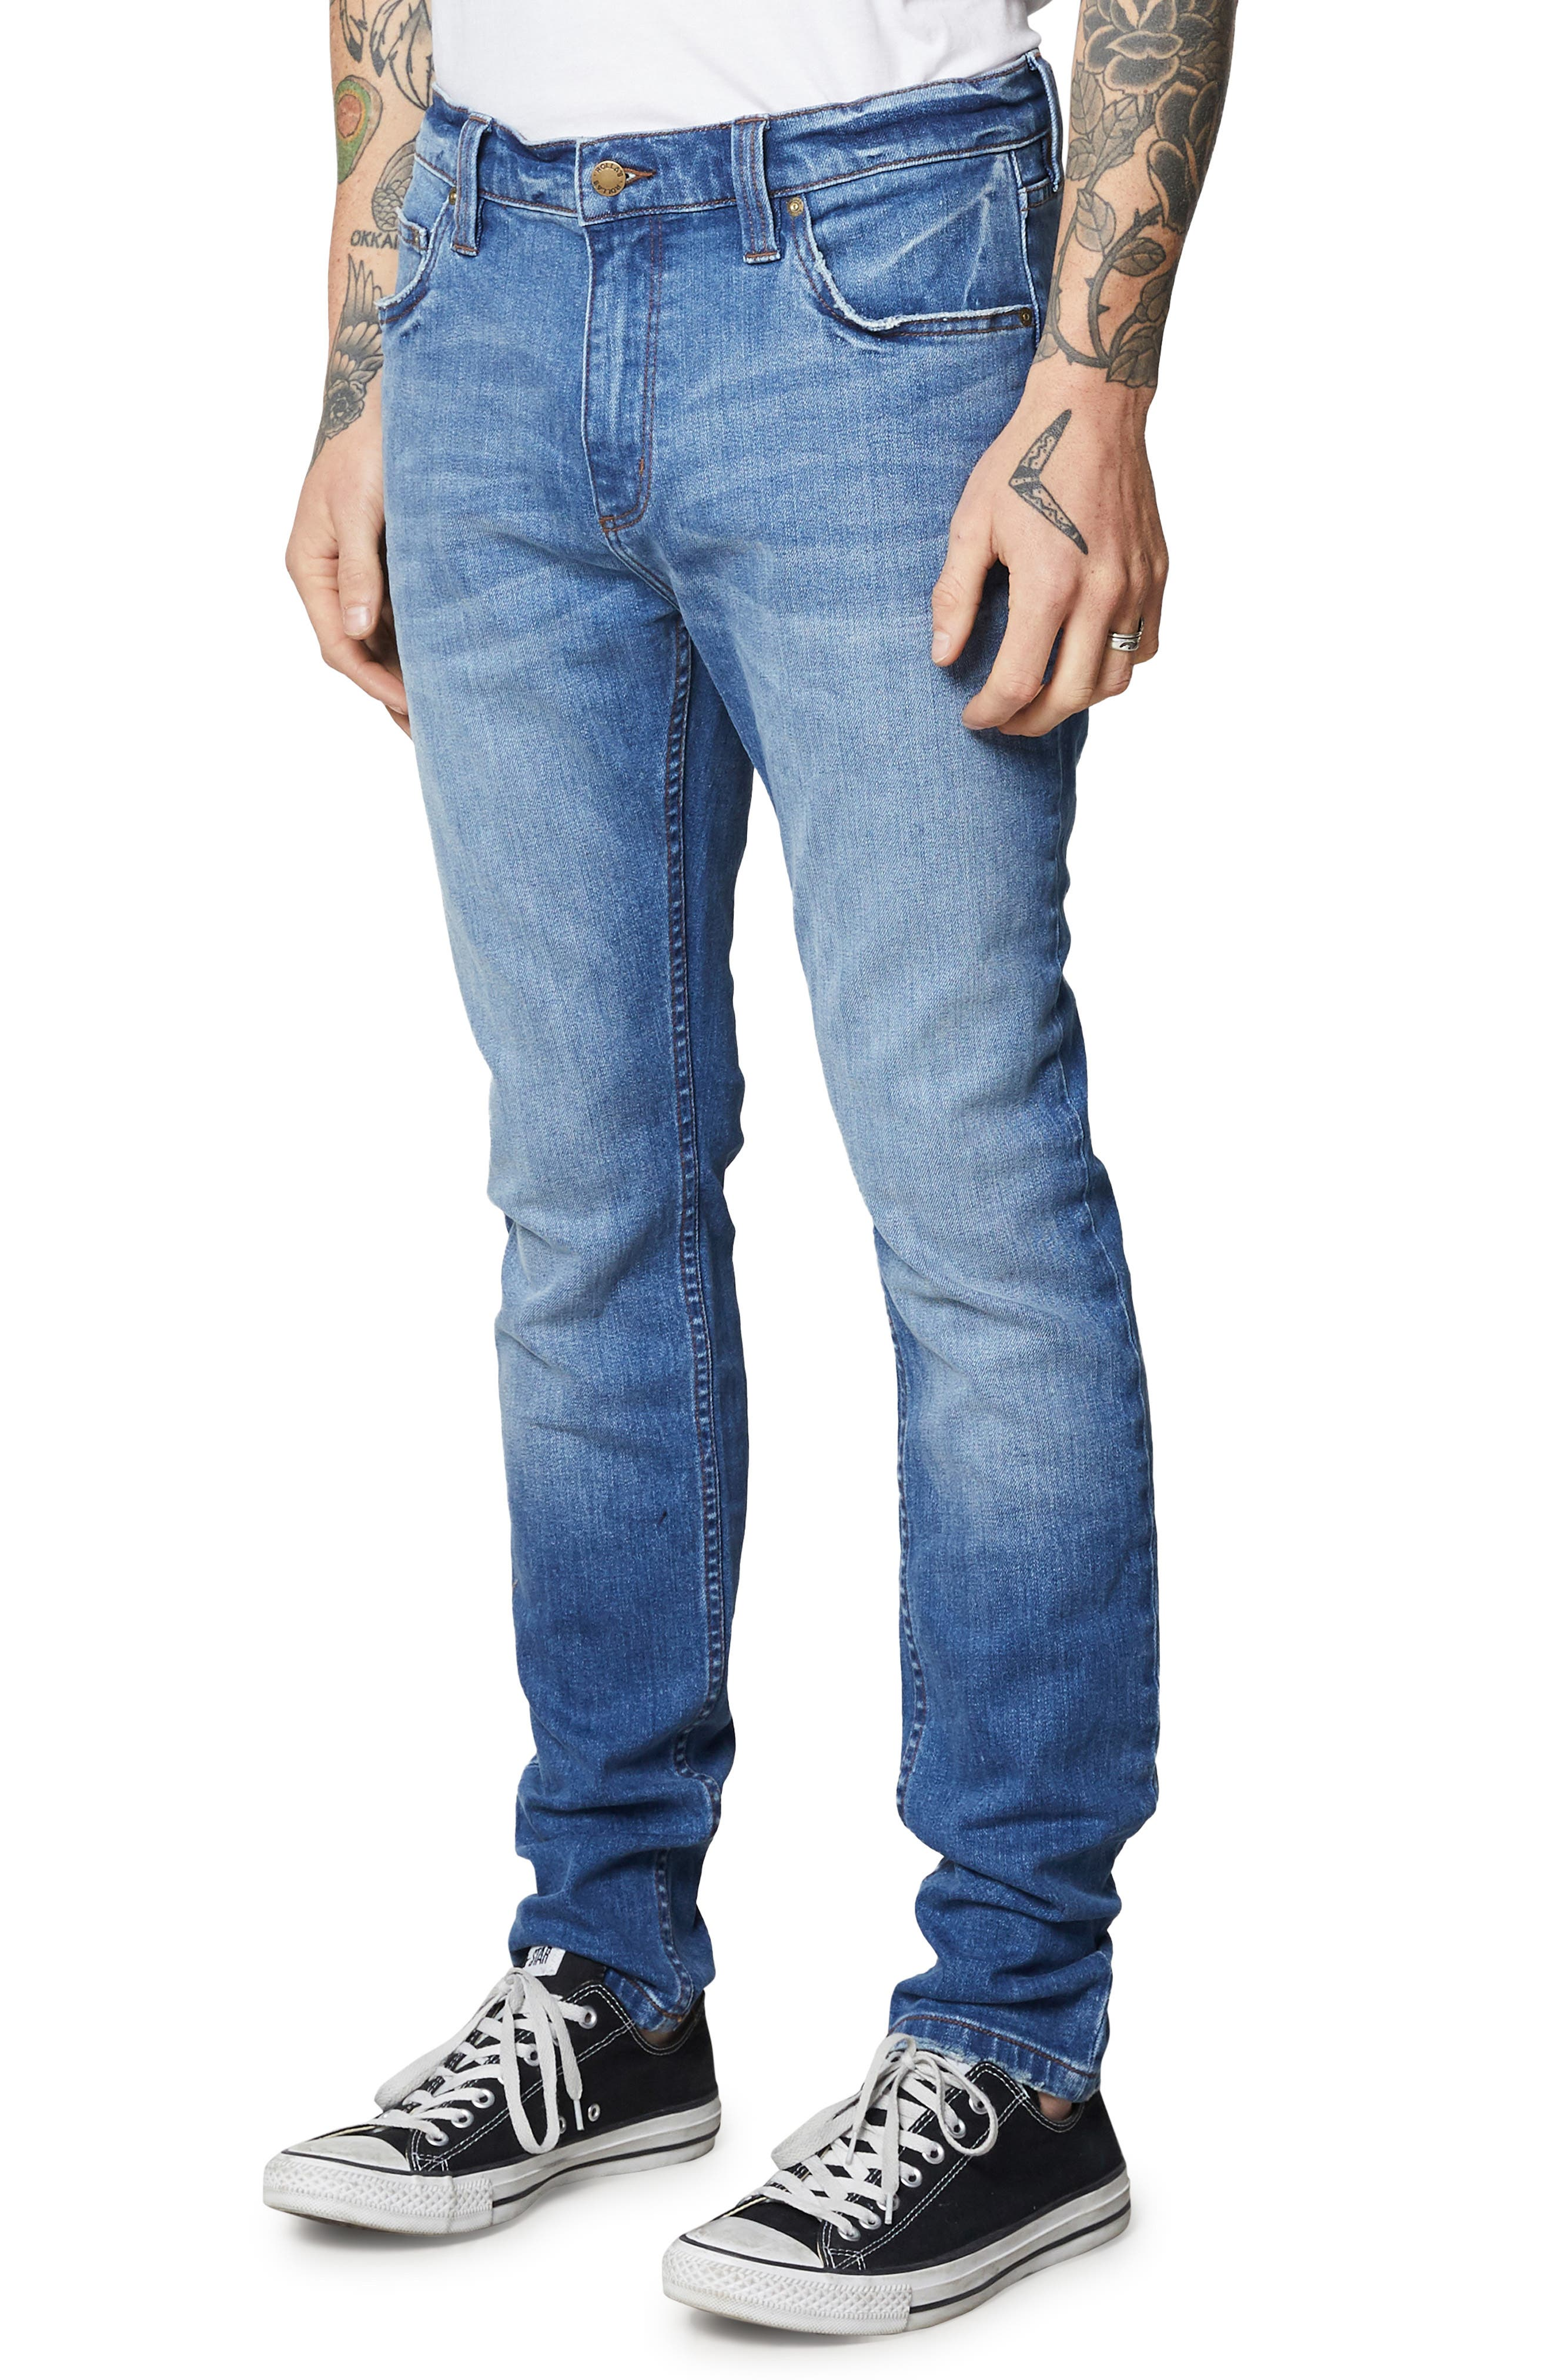 Stinger Skinny Fit Jeans,                             Alternate thumbnail 3, color,                             HOMESPUN CRUSH